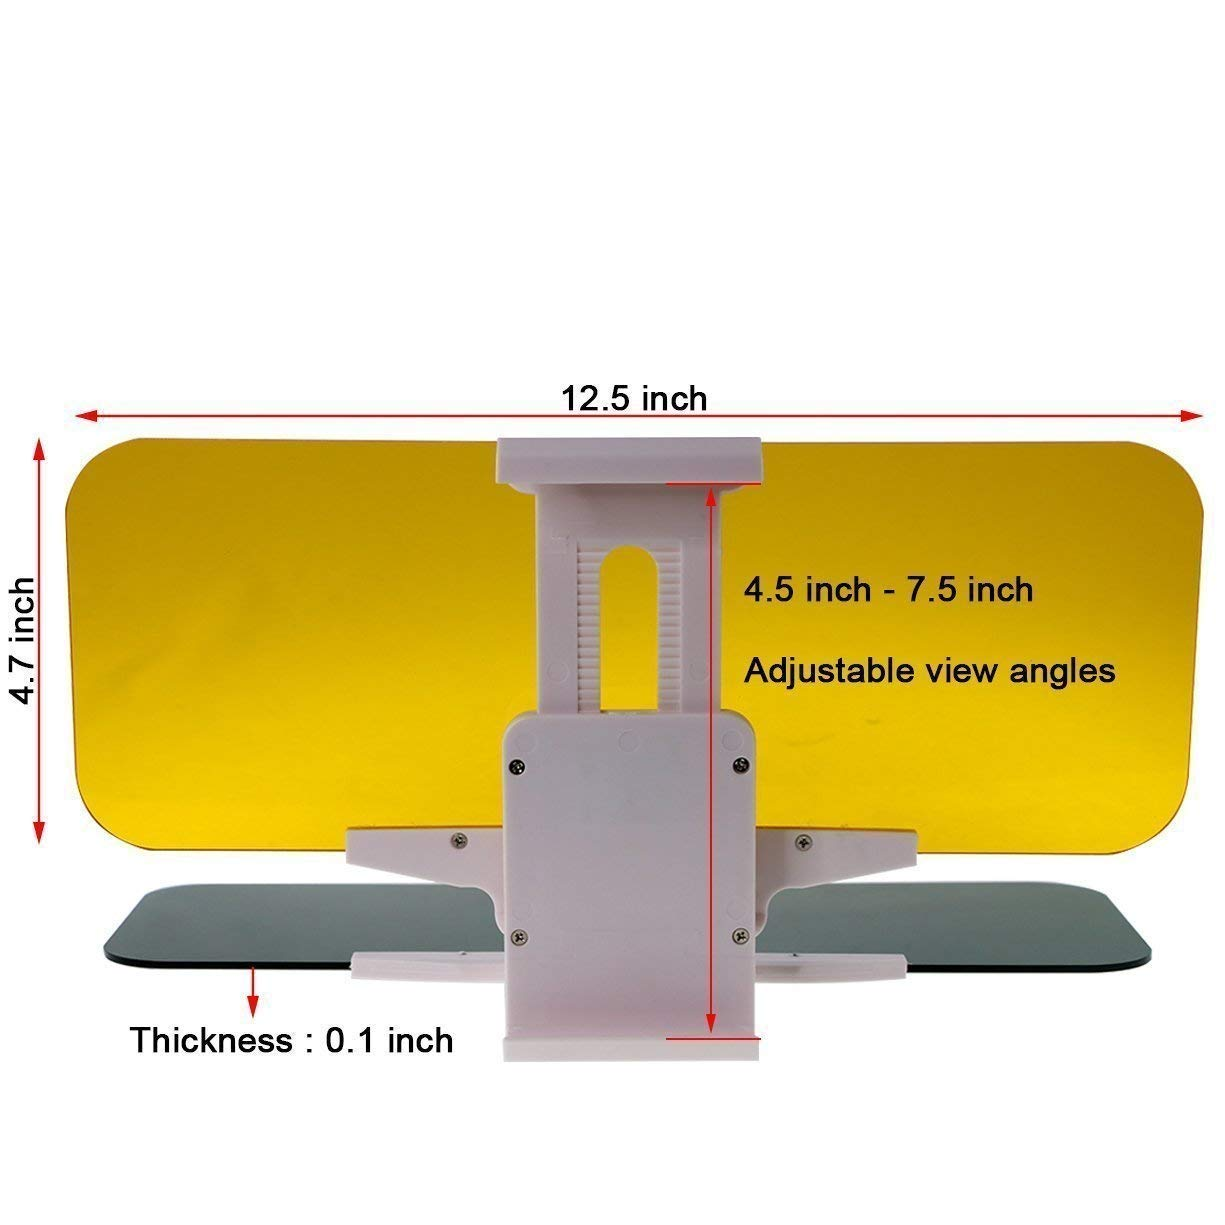 Blocking UV Rays Windshield Driving Visor 2 in 1 Car Sun Visors Transparent Windshiled Glass Yanztech Car Sun Visor Day and Night Vision Anti-Glare Visor